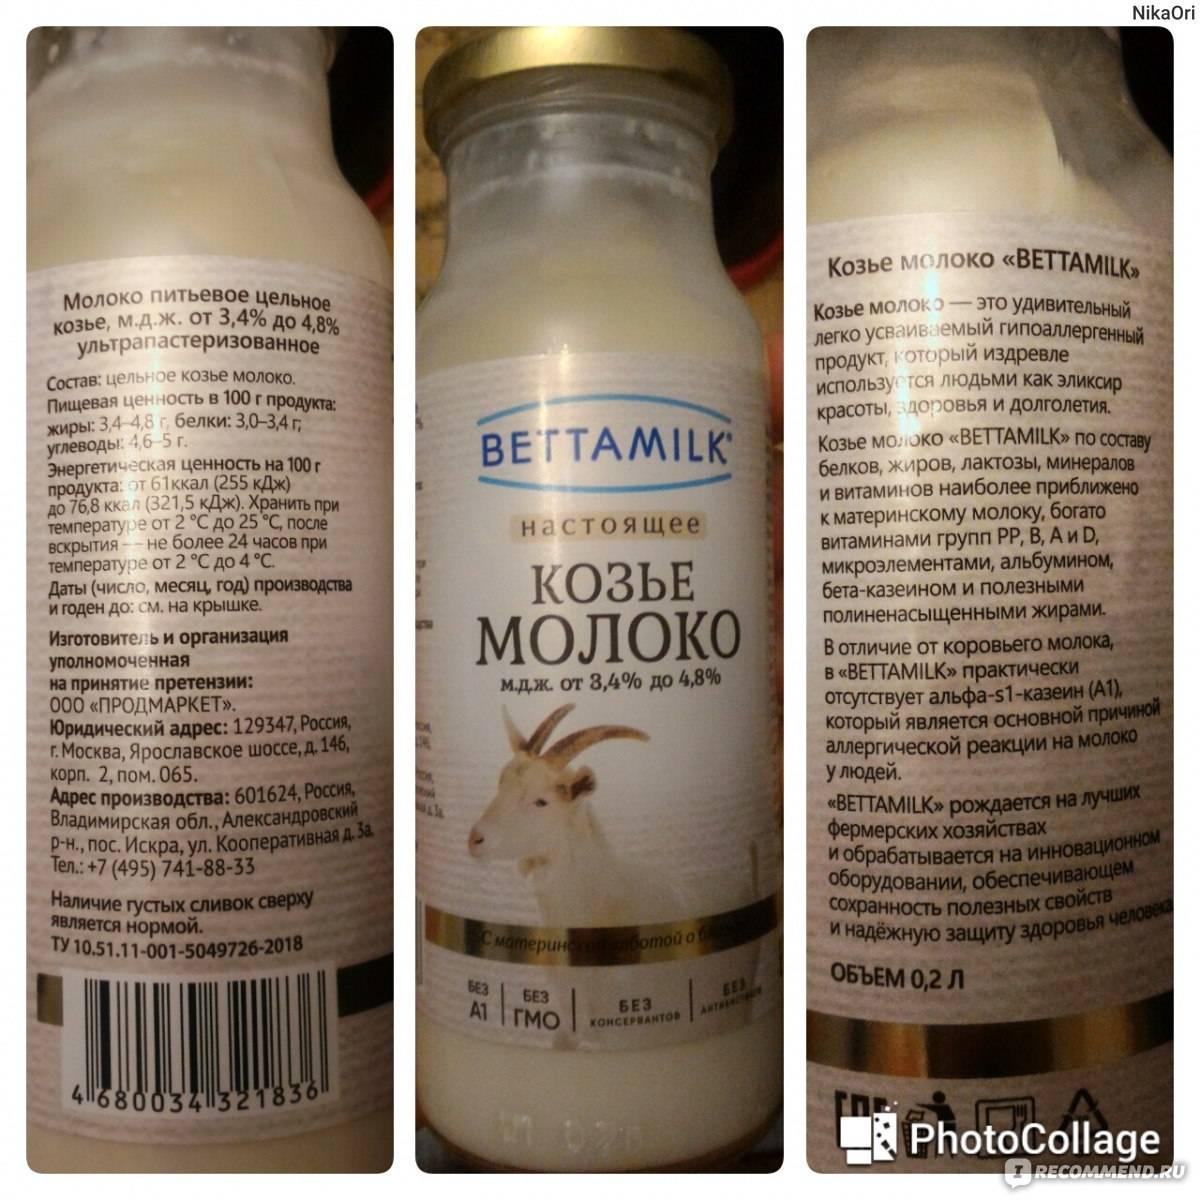 Можно ли котятам молоко - молоко для котенка: полезно или вредно?